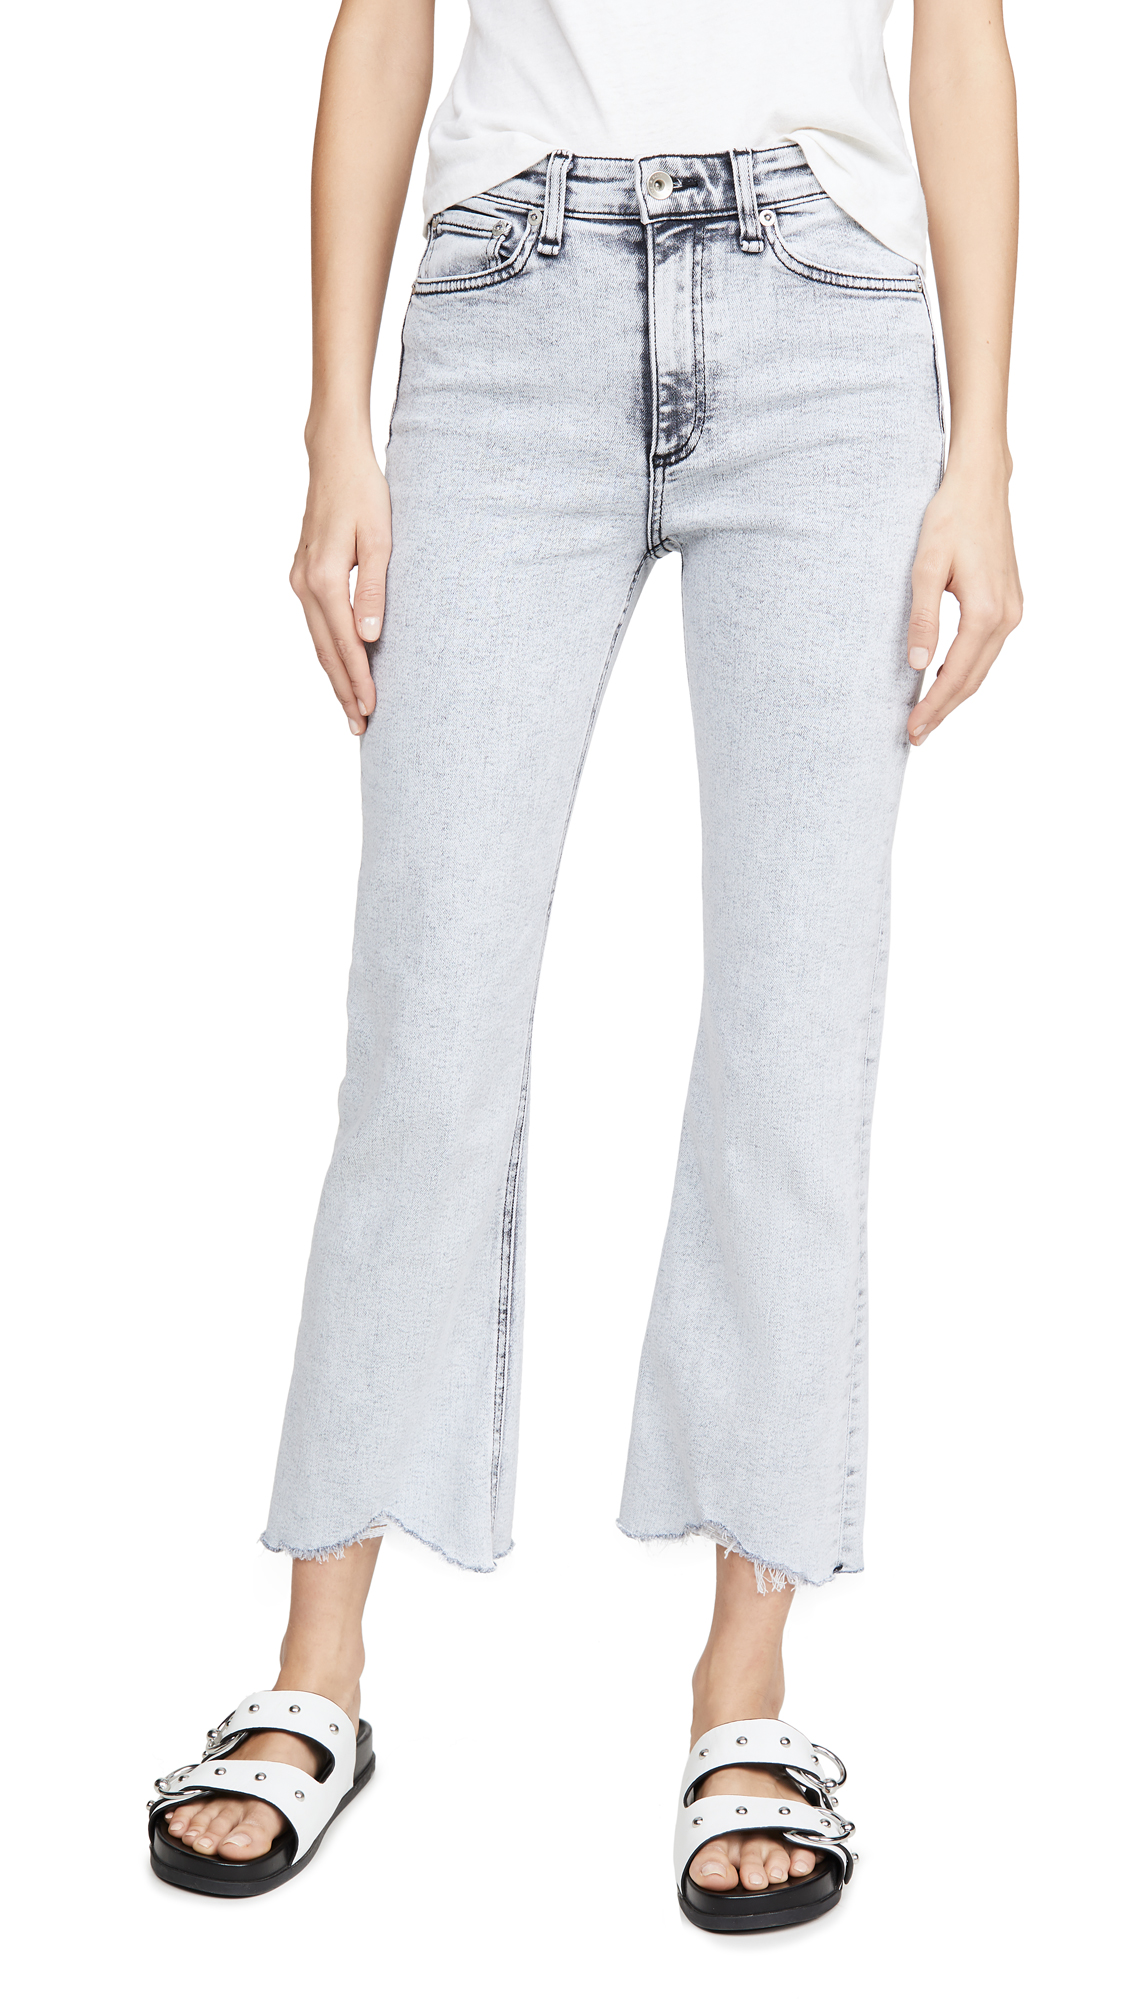 Buy Rag & Bone/JEAN online - photo of Rag & Bone/JEAN Nina High Rise Ankle Flare Jeans